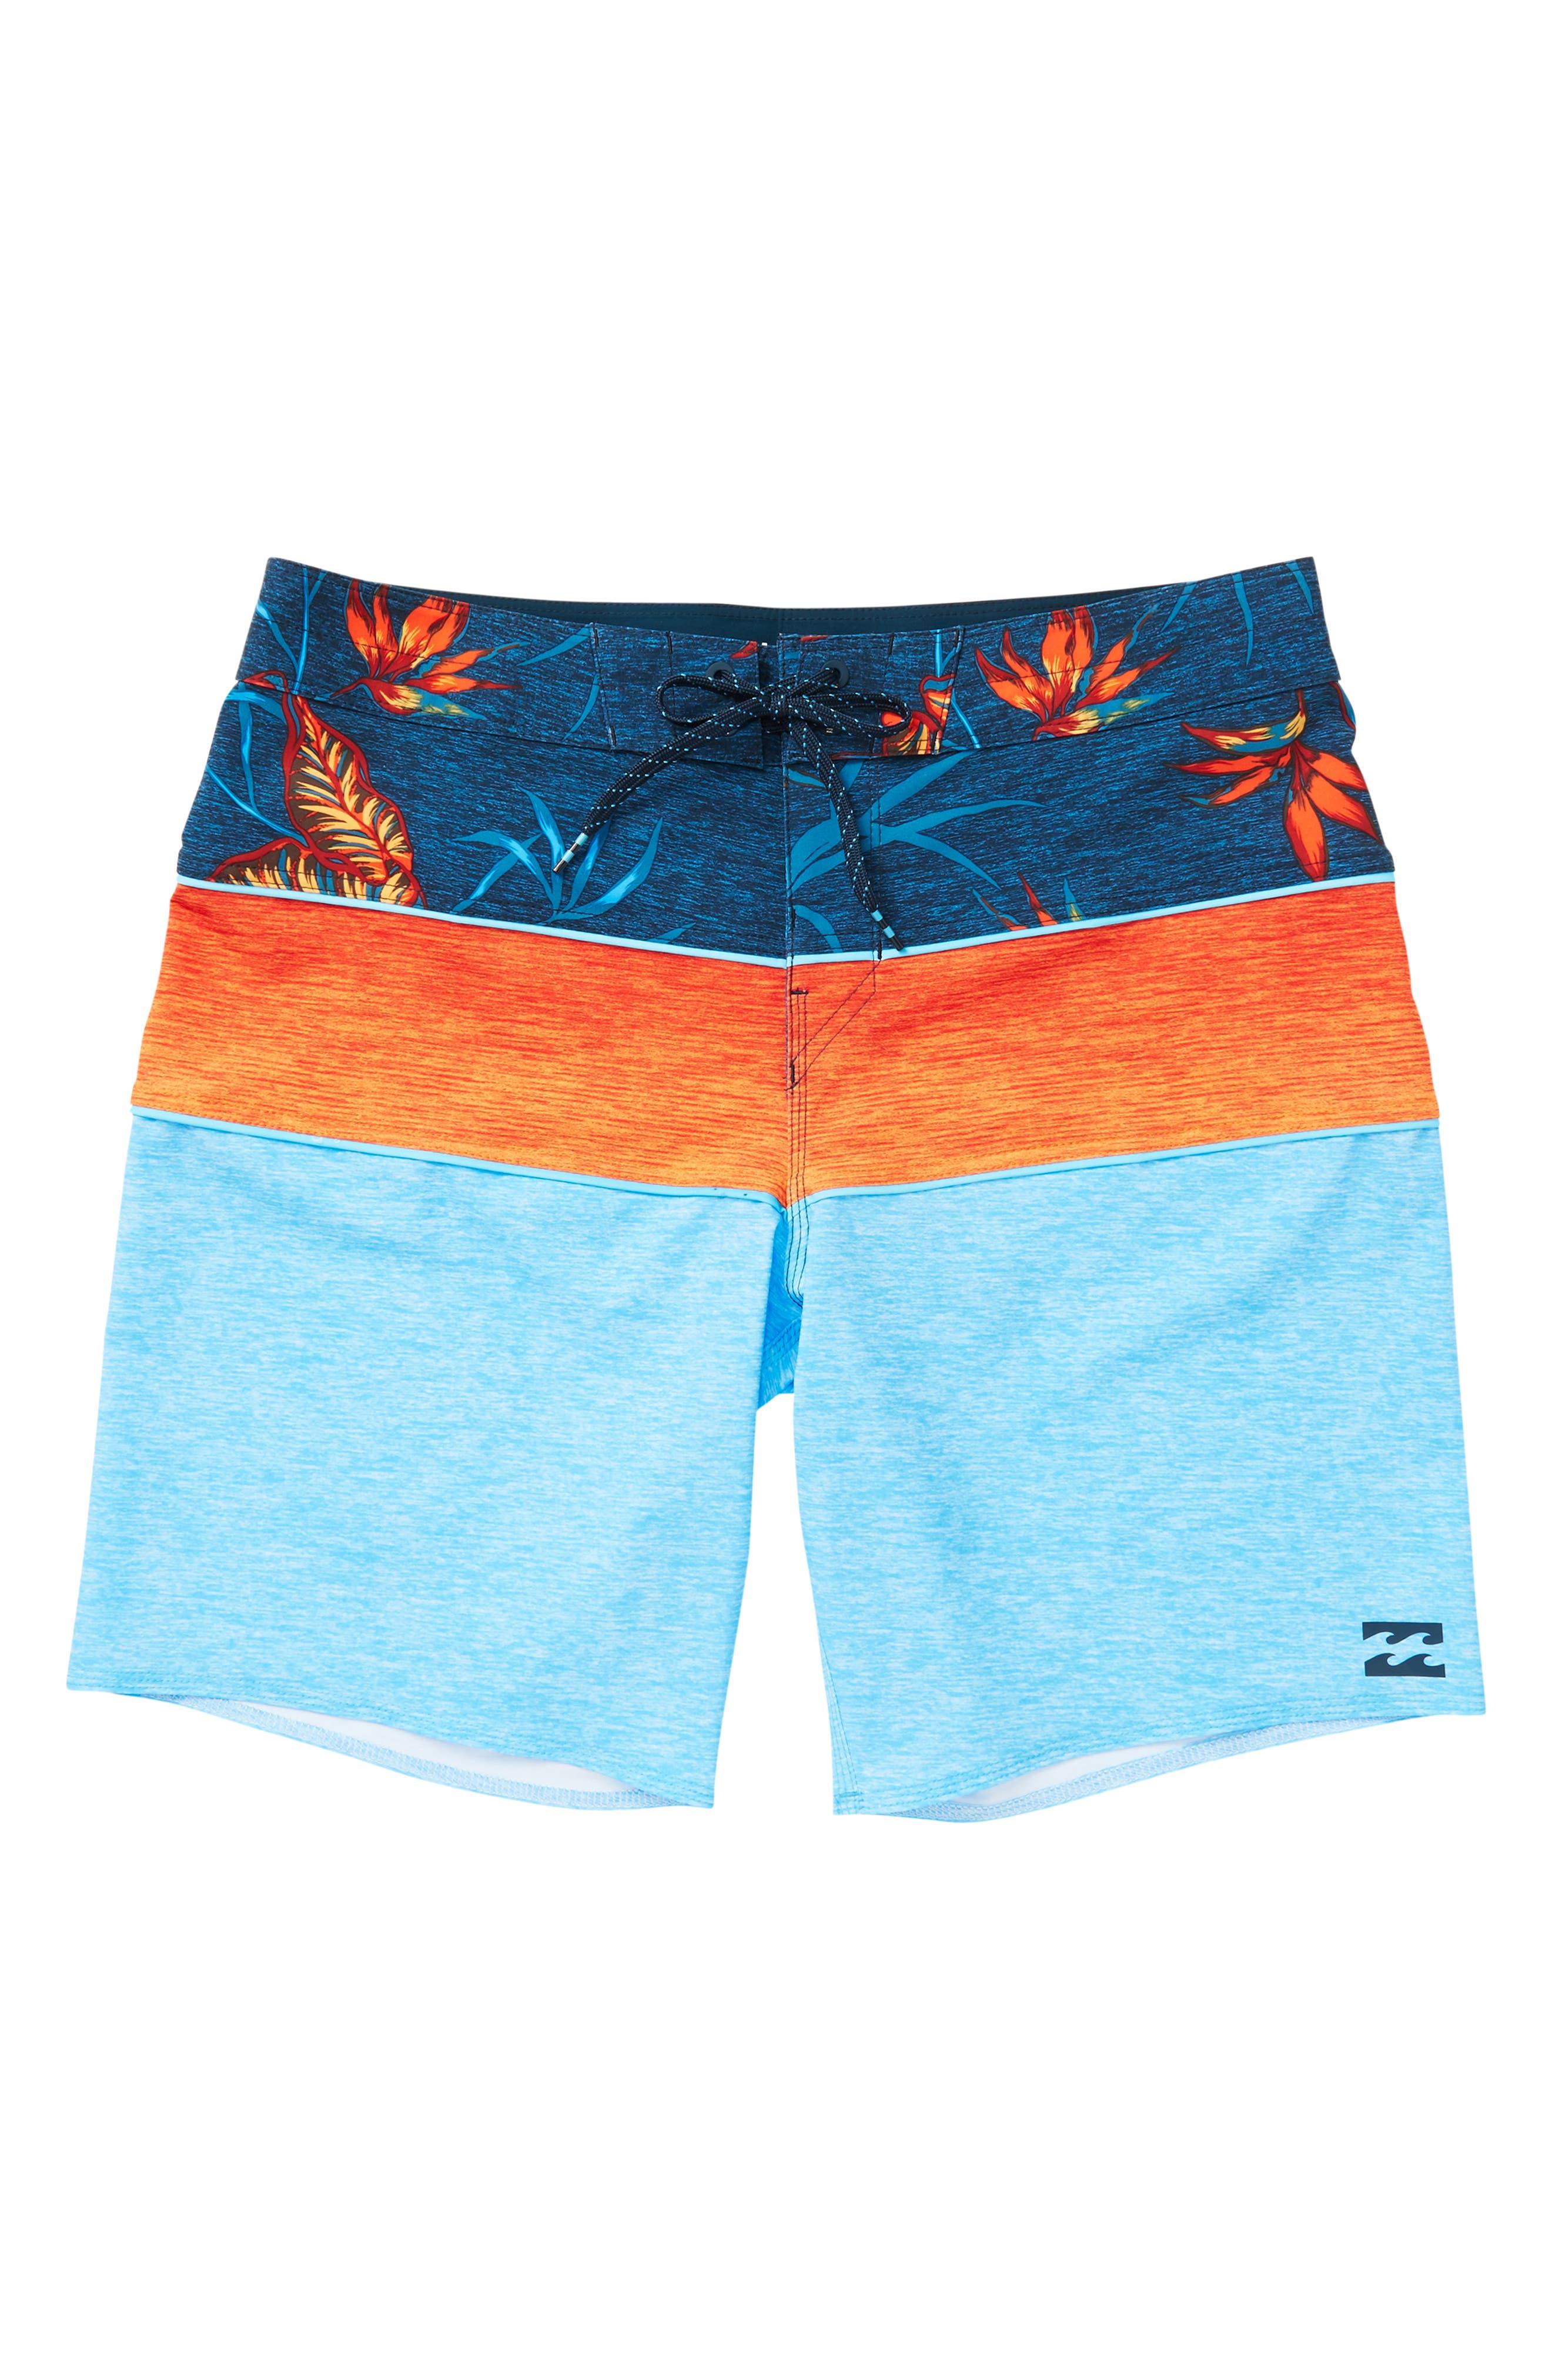 Tribong X Board Shorts,                         Main,                         color, CYAN